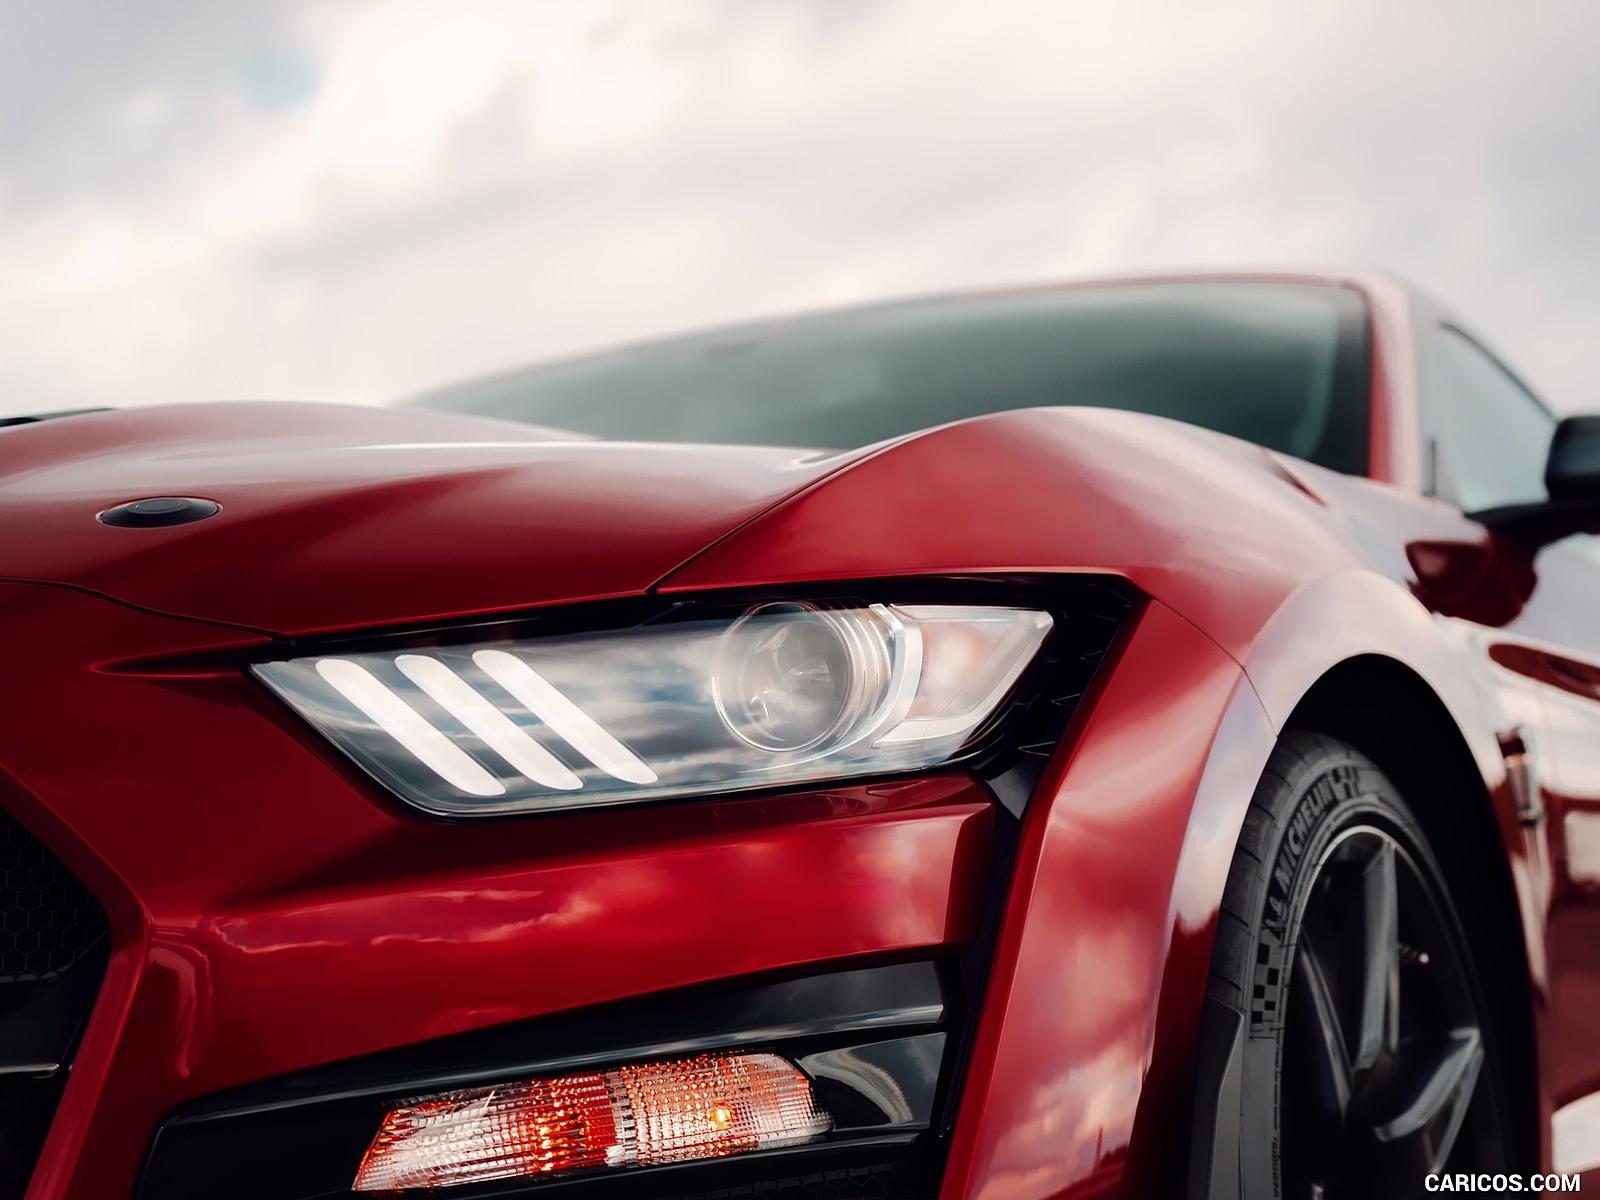 Ford Mustang Shelby 8k fotoğrafları